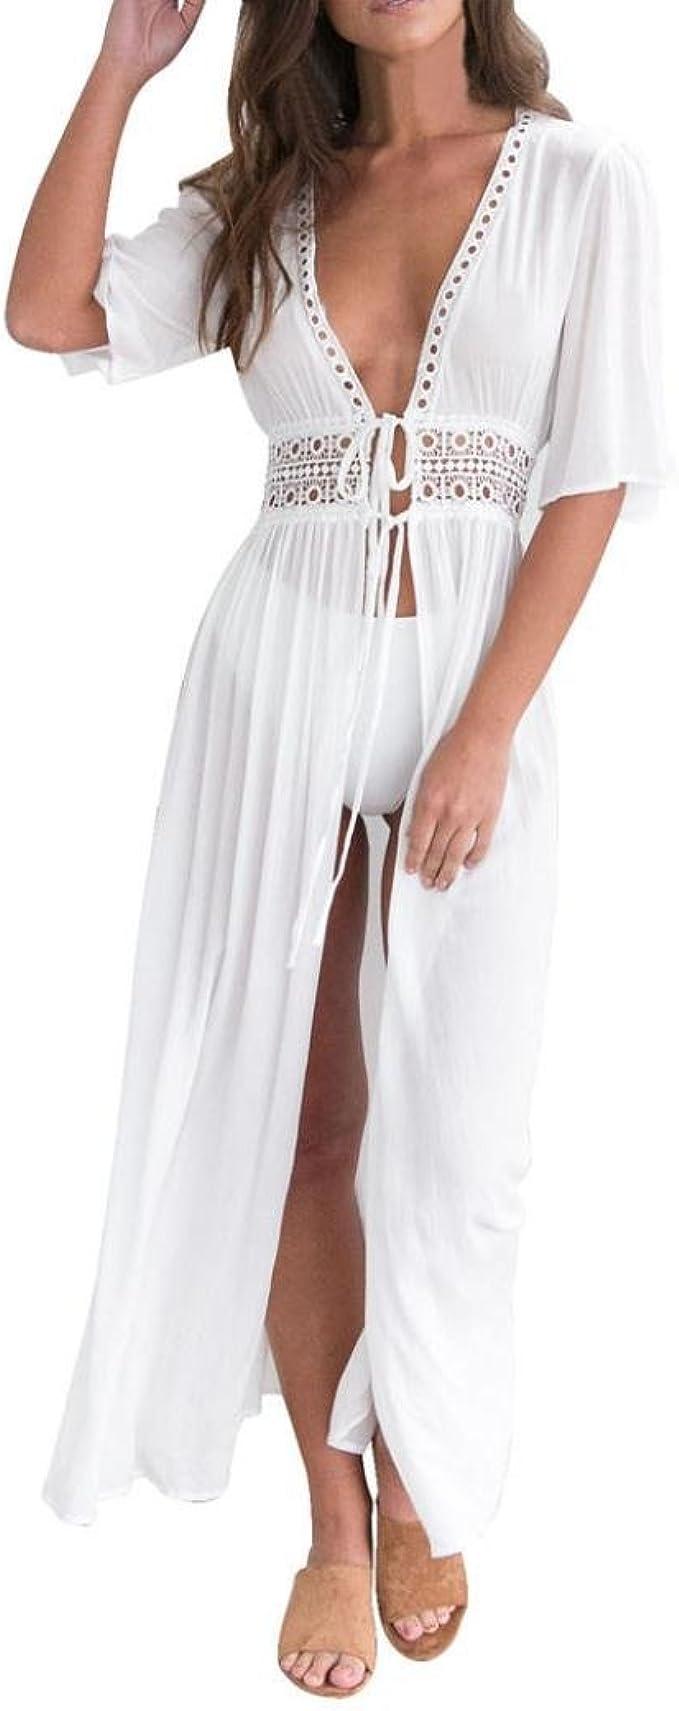 Kleid Damen Maxikleid Kolylong® Frauen V-Ausschnitt Elegantes weißes langes  Kleid Sommer Strandkleid Party Kleid Badeanzug Kleid Bikini Badebekleidung